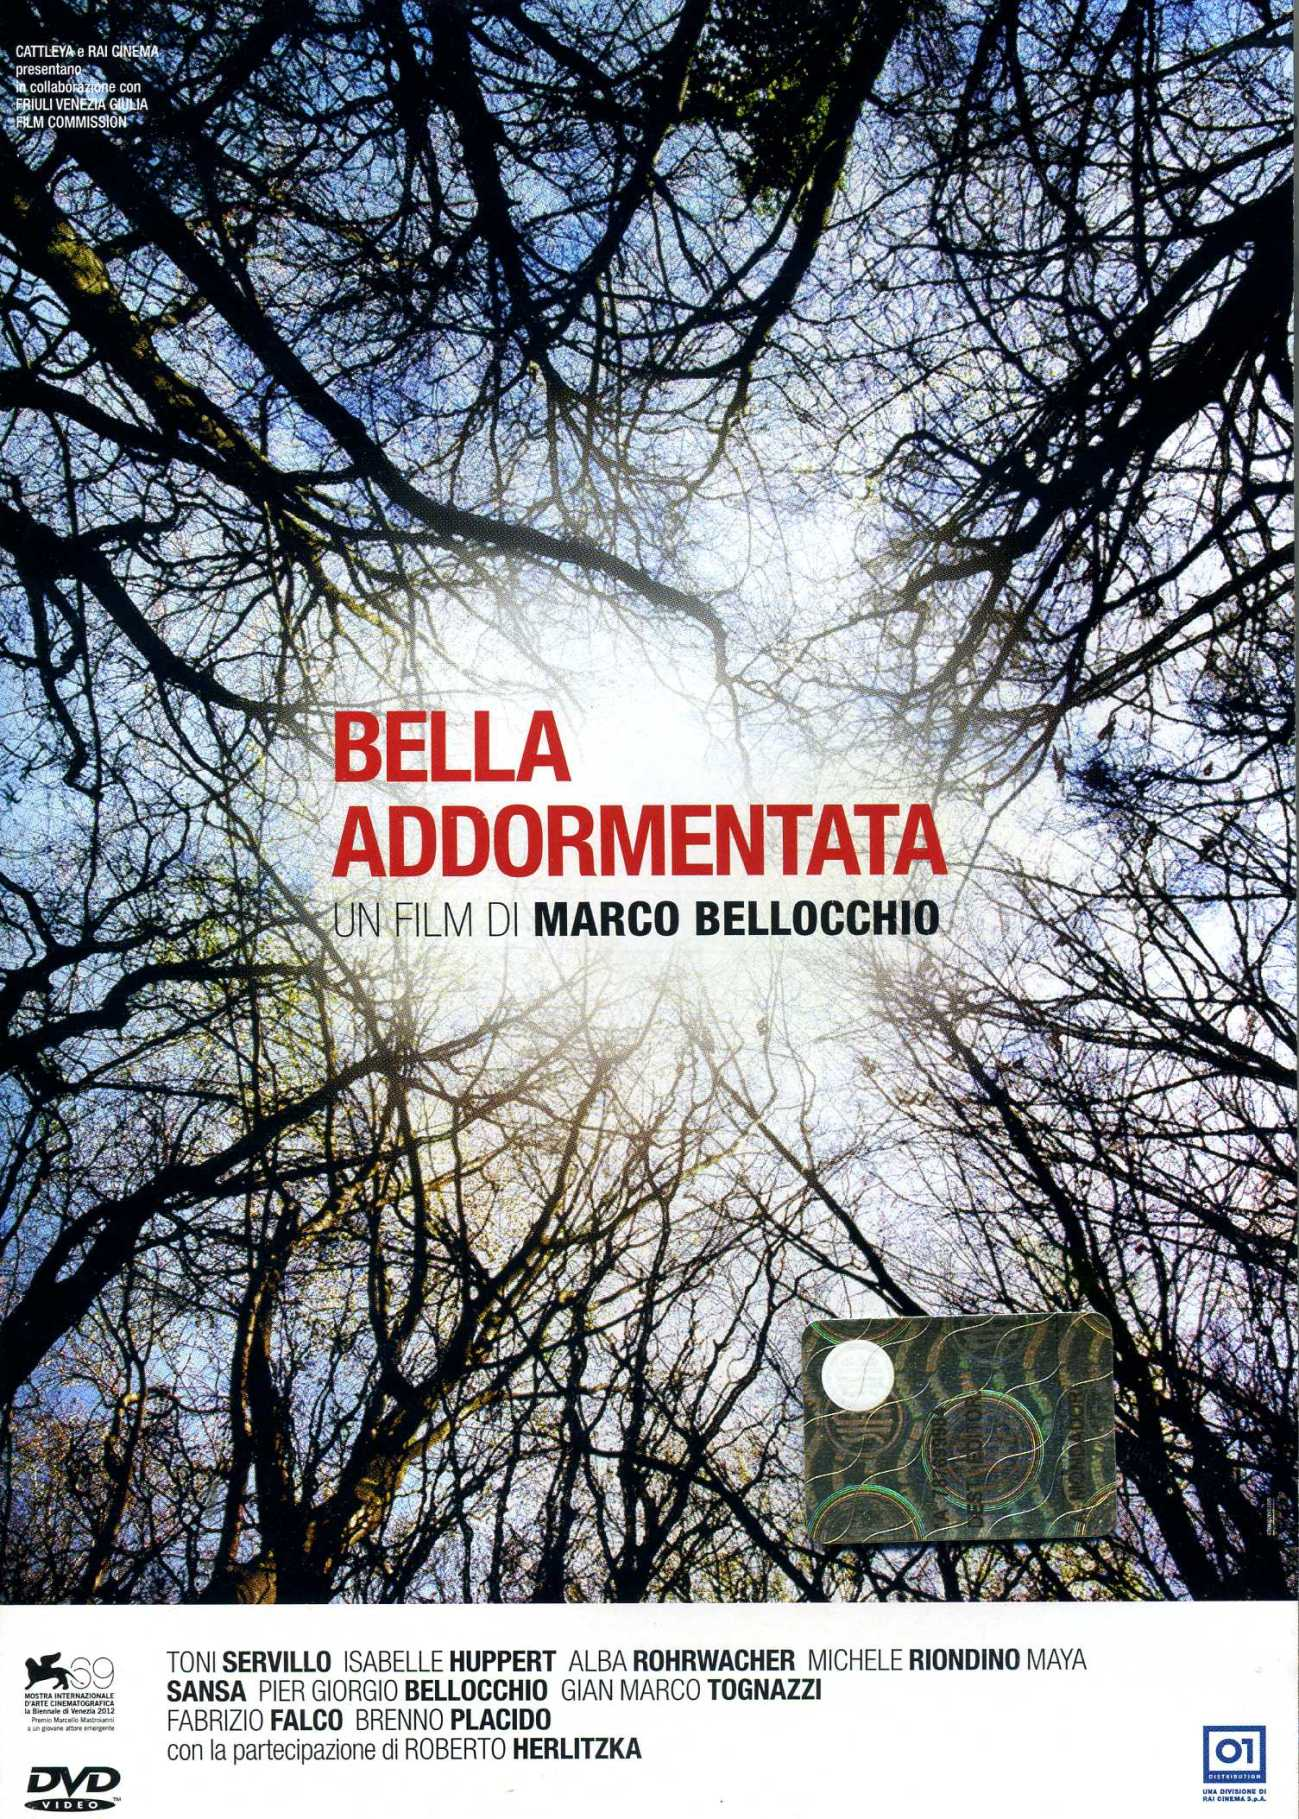 belladdormentata283